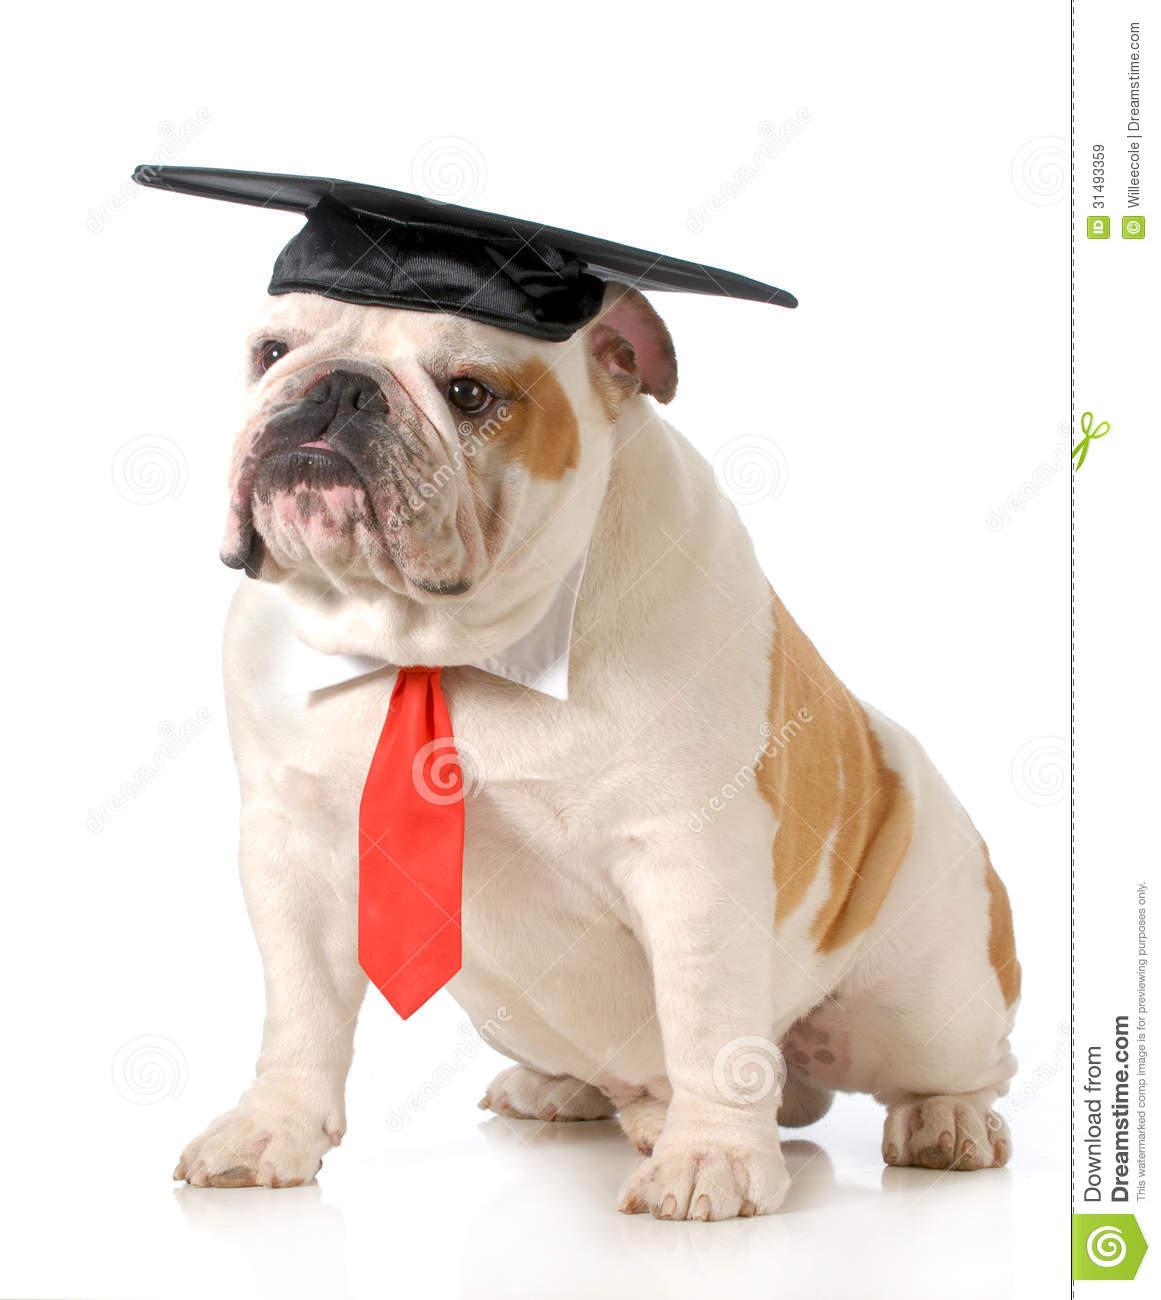 5752 Graduation free clipart.